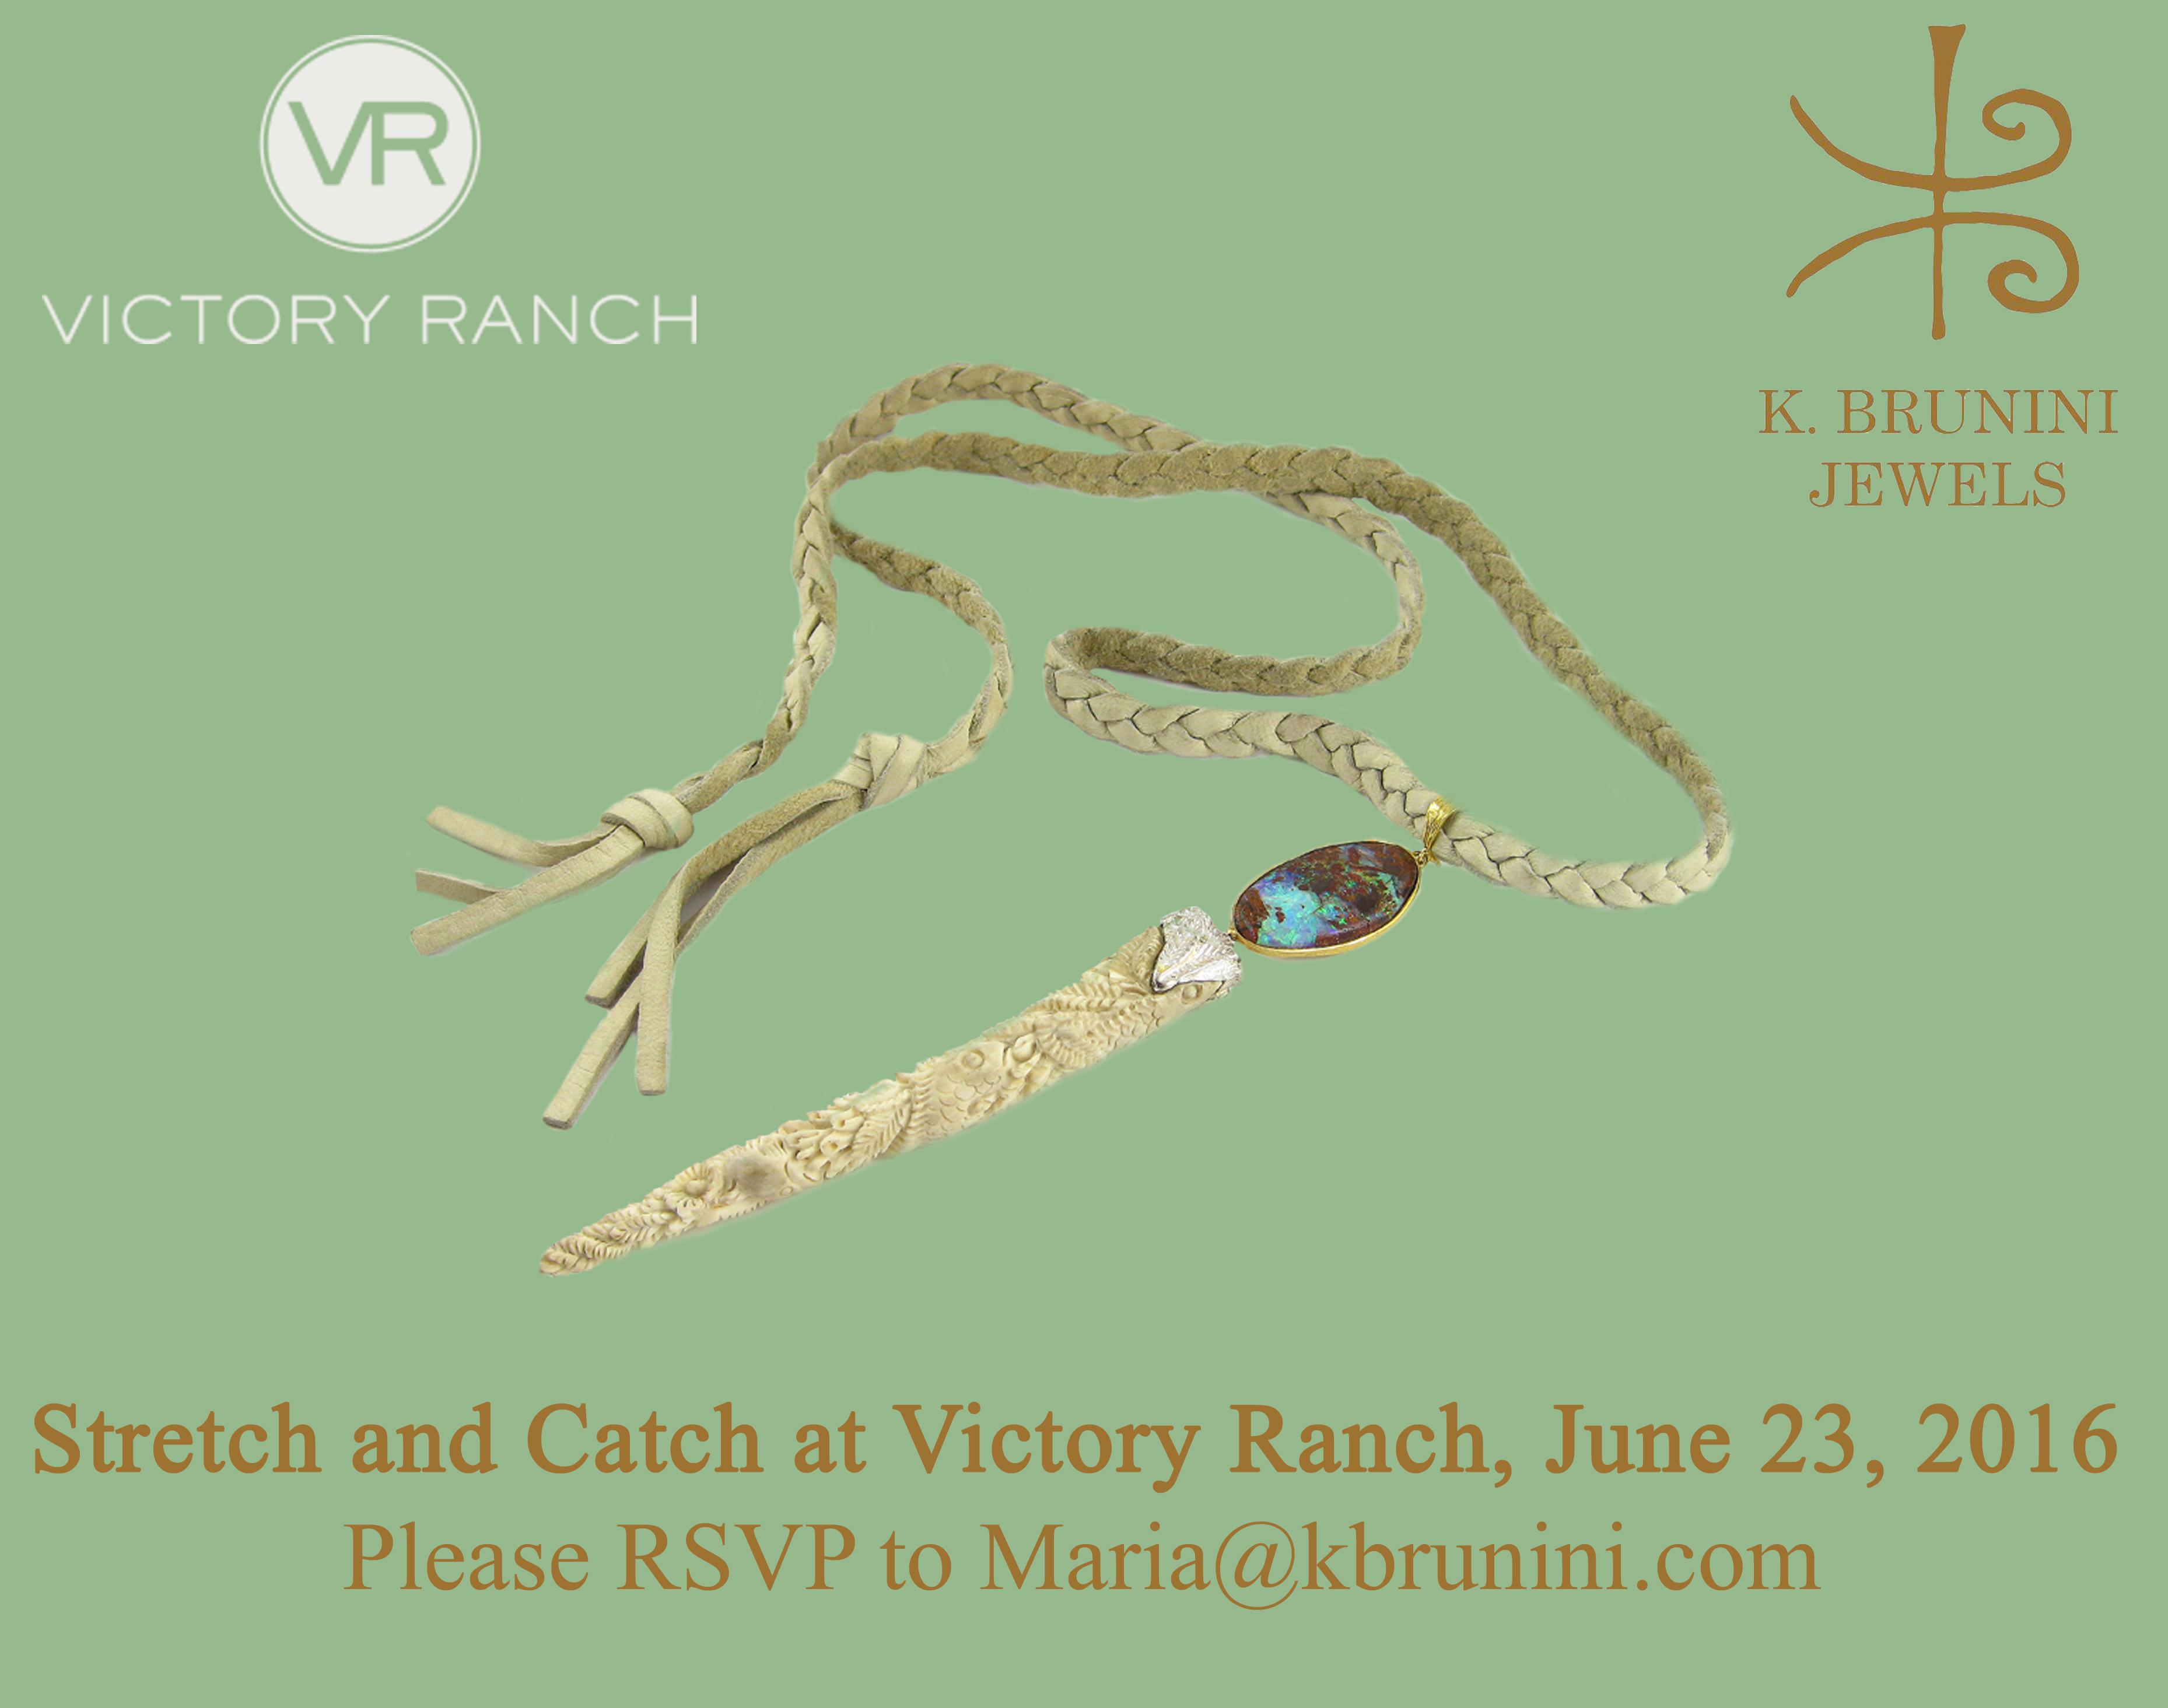 K Brunini, Victory Ranch, Jewelry, Park City, Utah